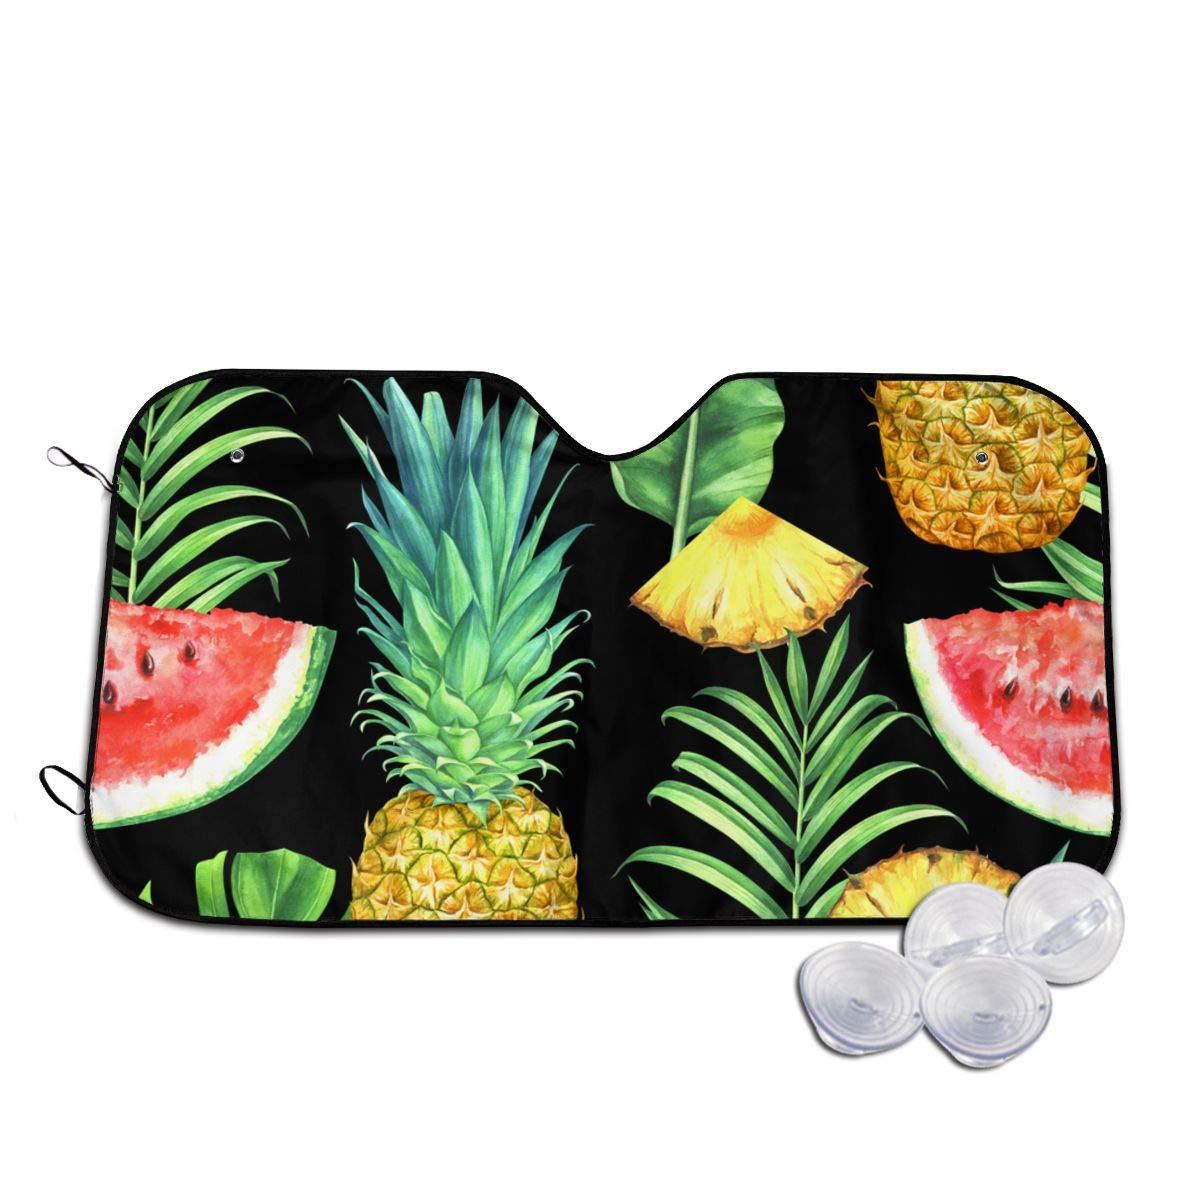 Pineapples Watermelons and Leaves Heat Resist Sunshade Waterproof Lightweight Window Shade Aluminum Sunshield for Truck Camper Car